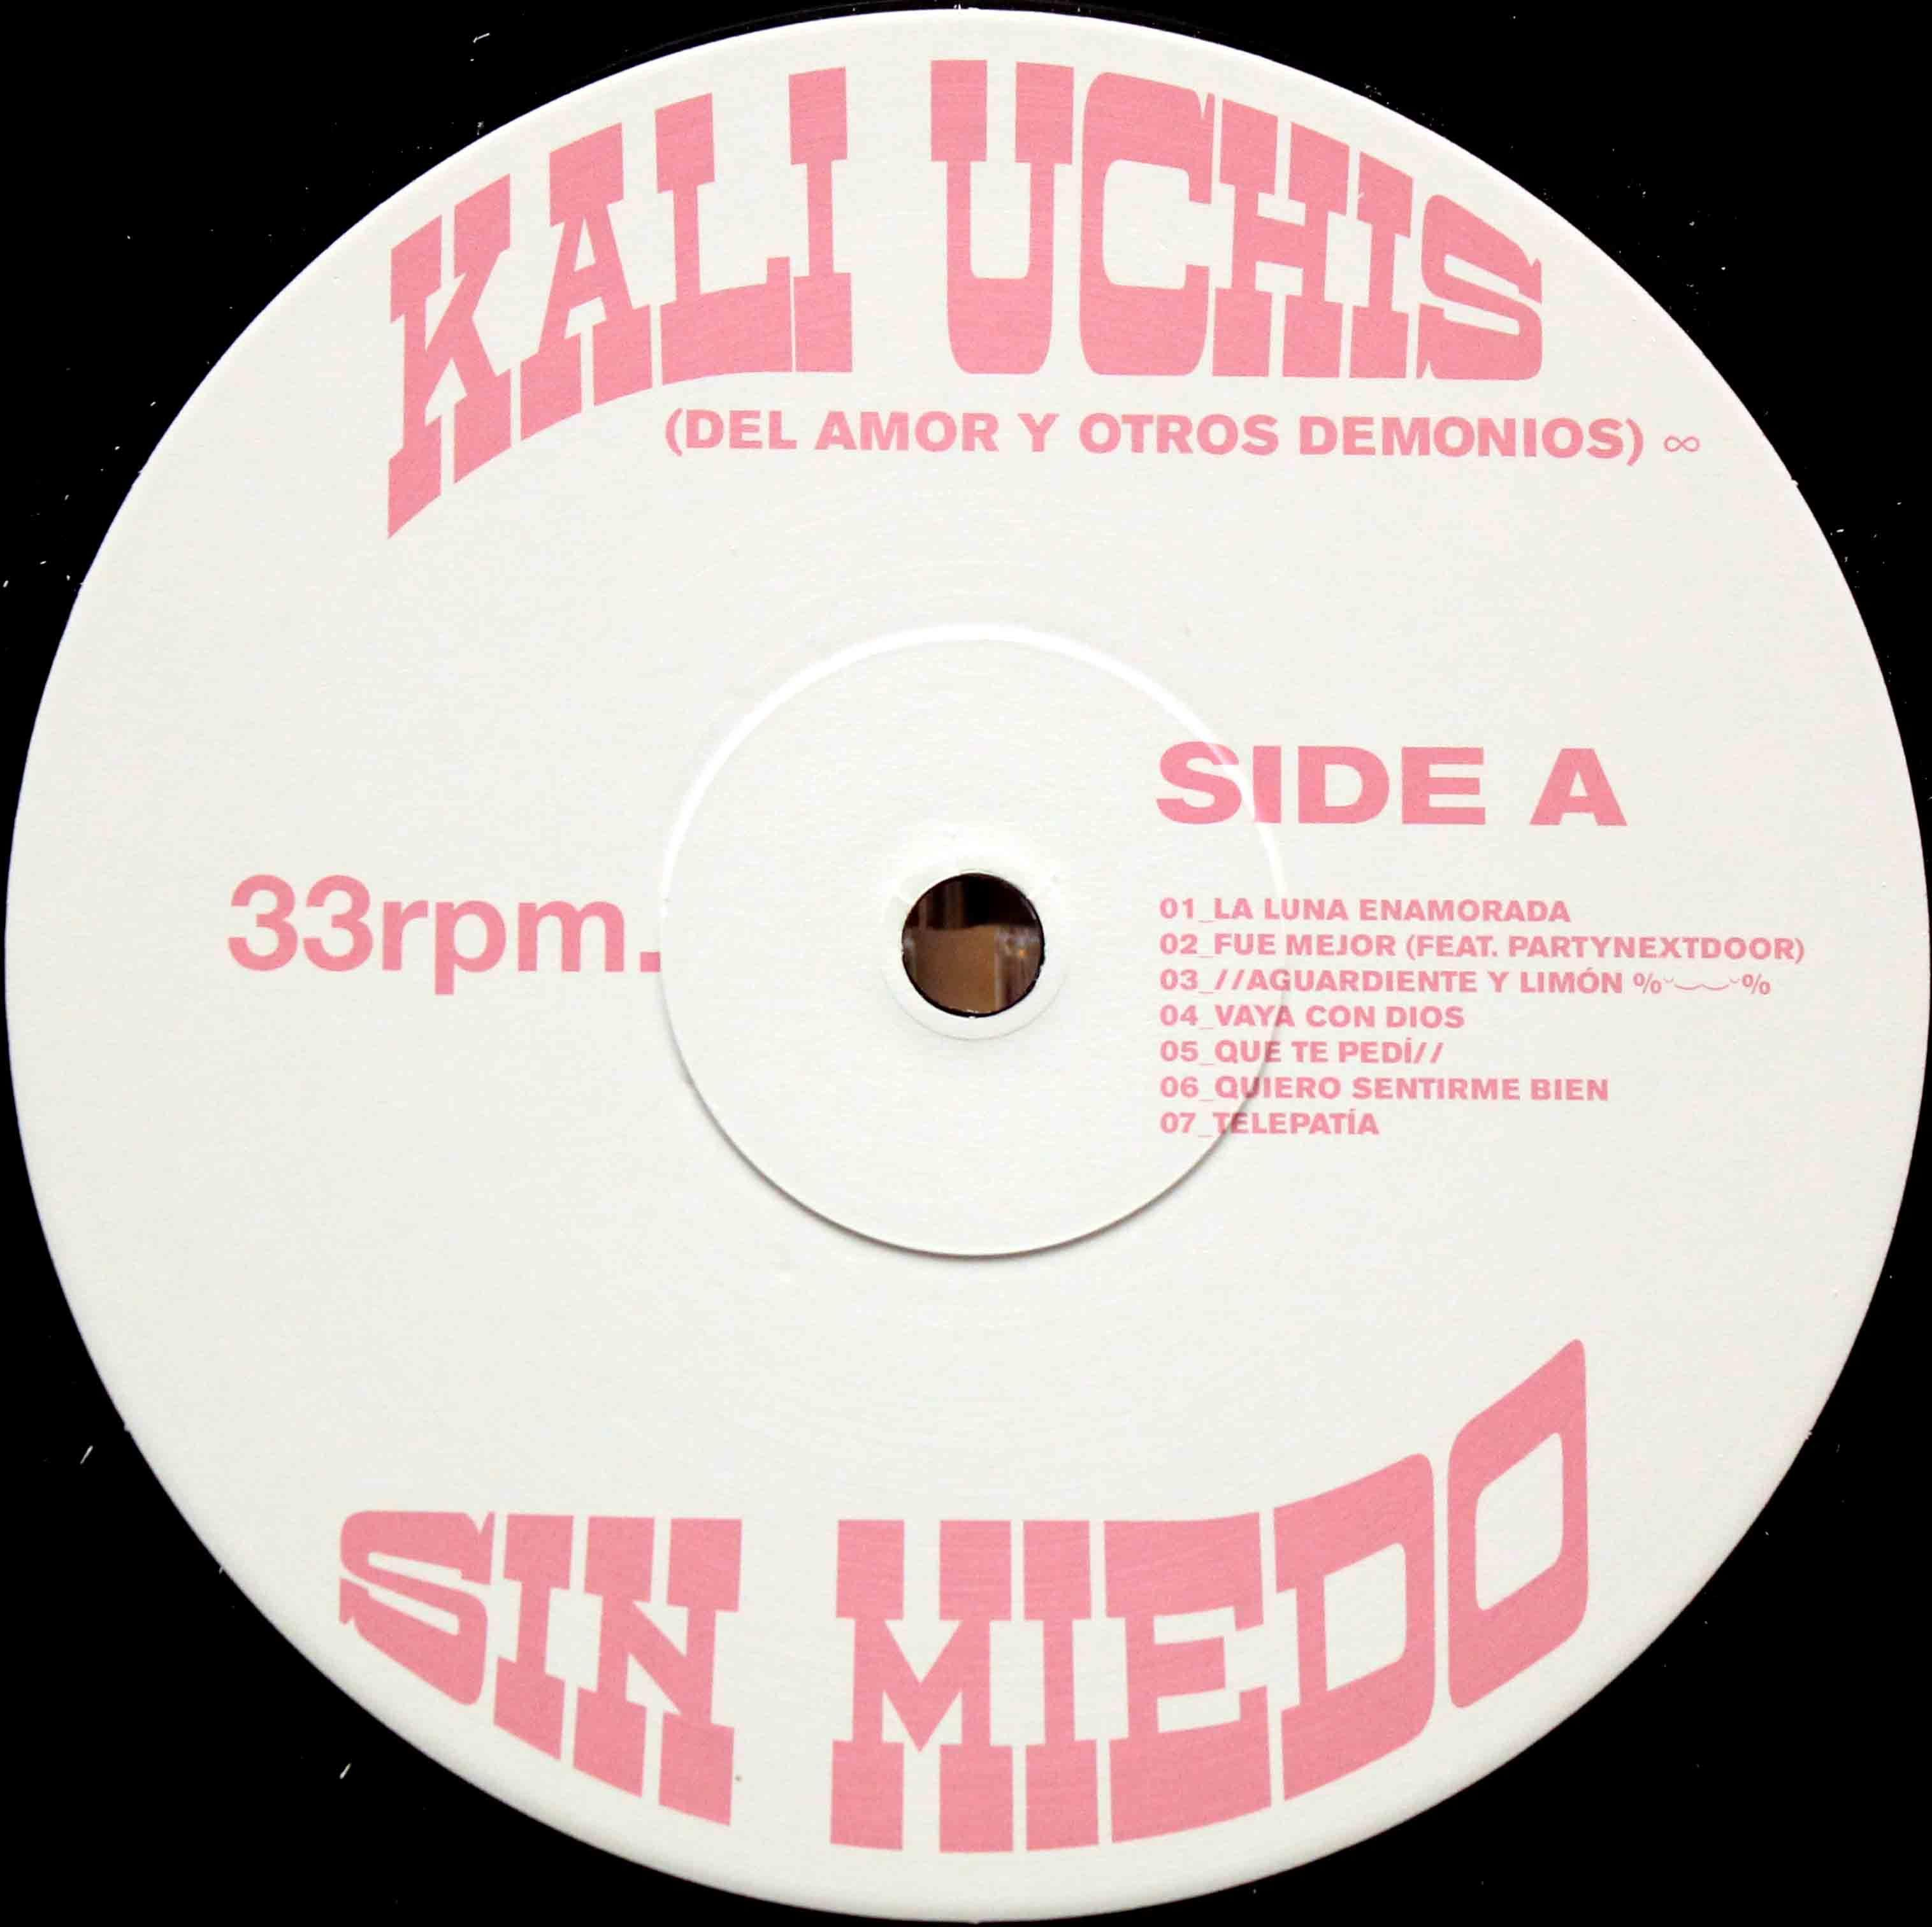 Kali Uchis - Sin Miedo 05